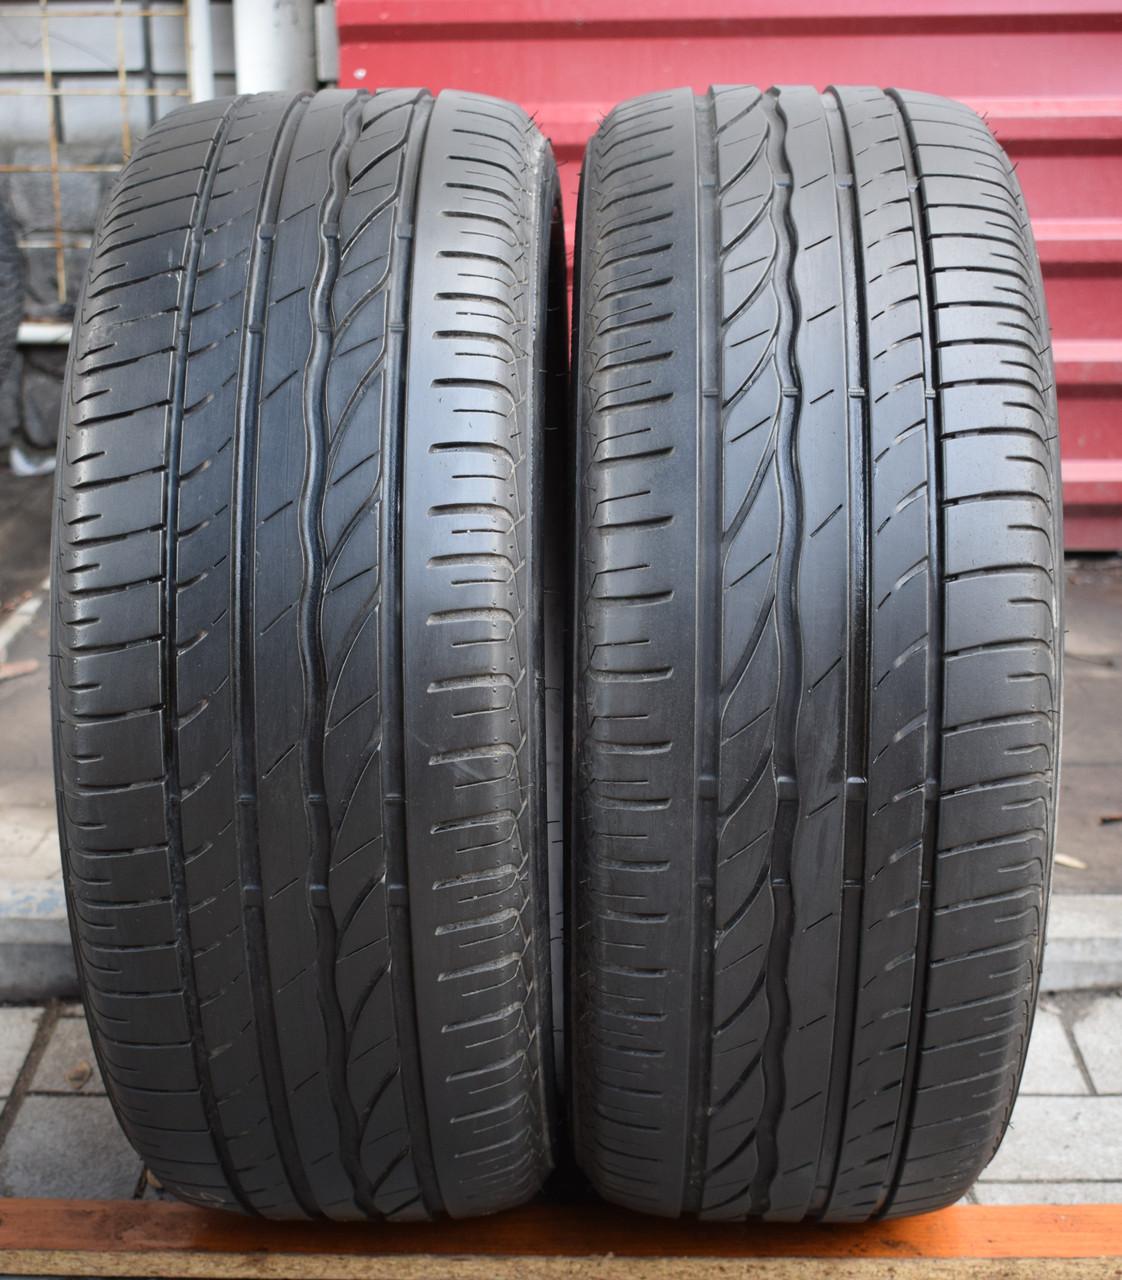 Шины б/у 215/55 R16 Bridgestone Turanza ER300, ЛЕТО, пара, 5-6 мм